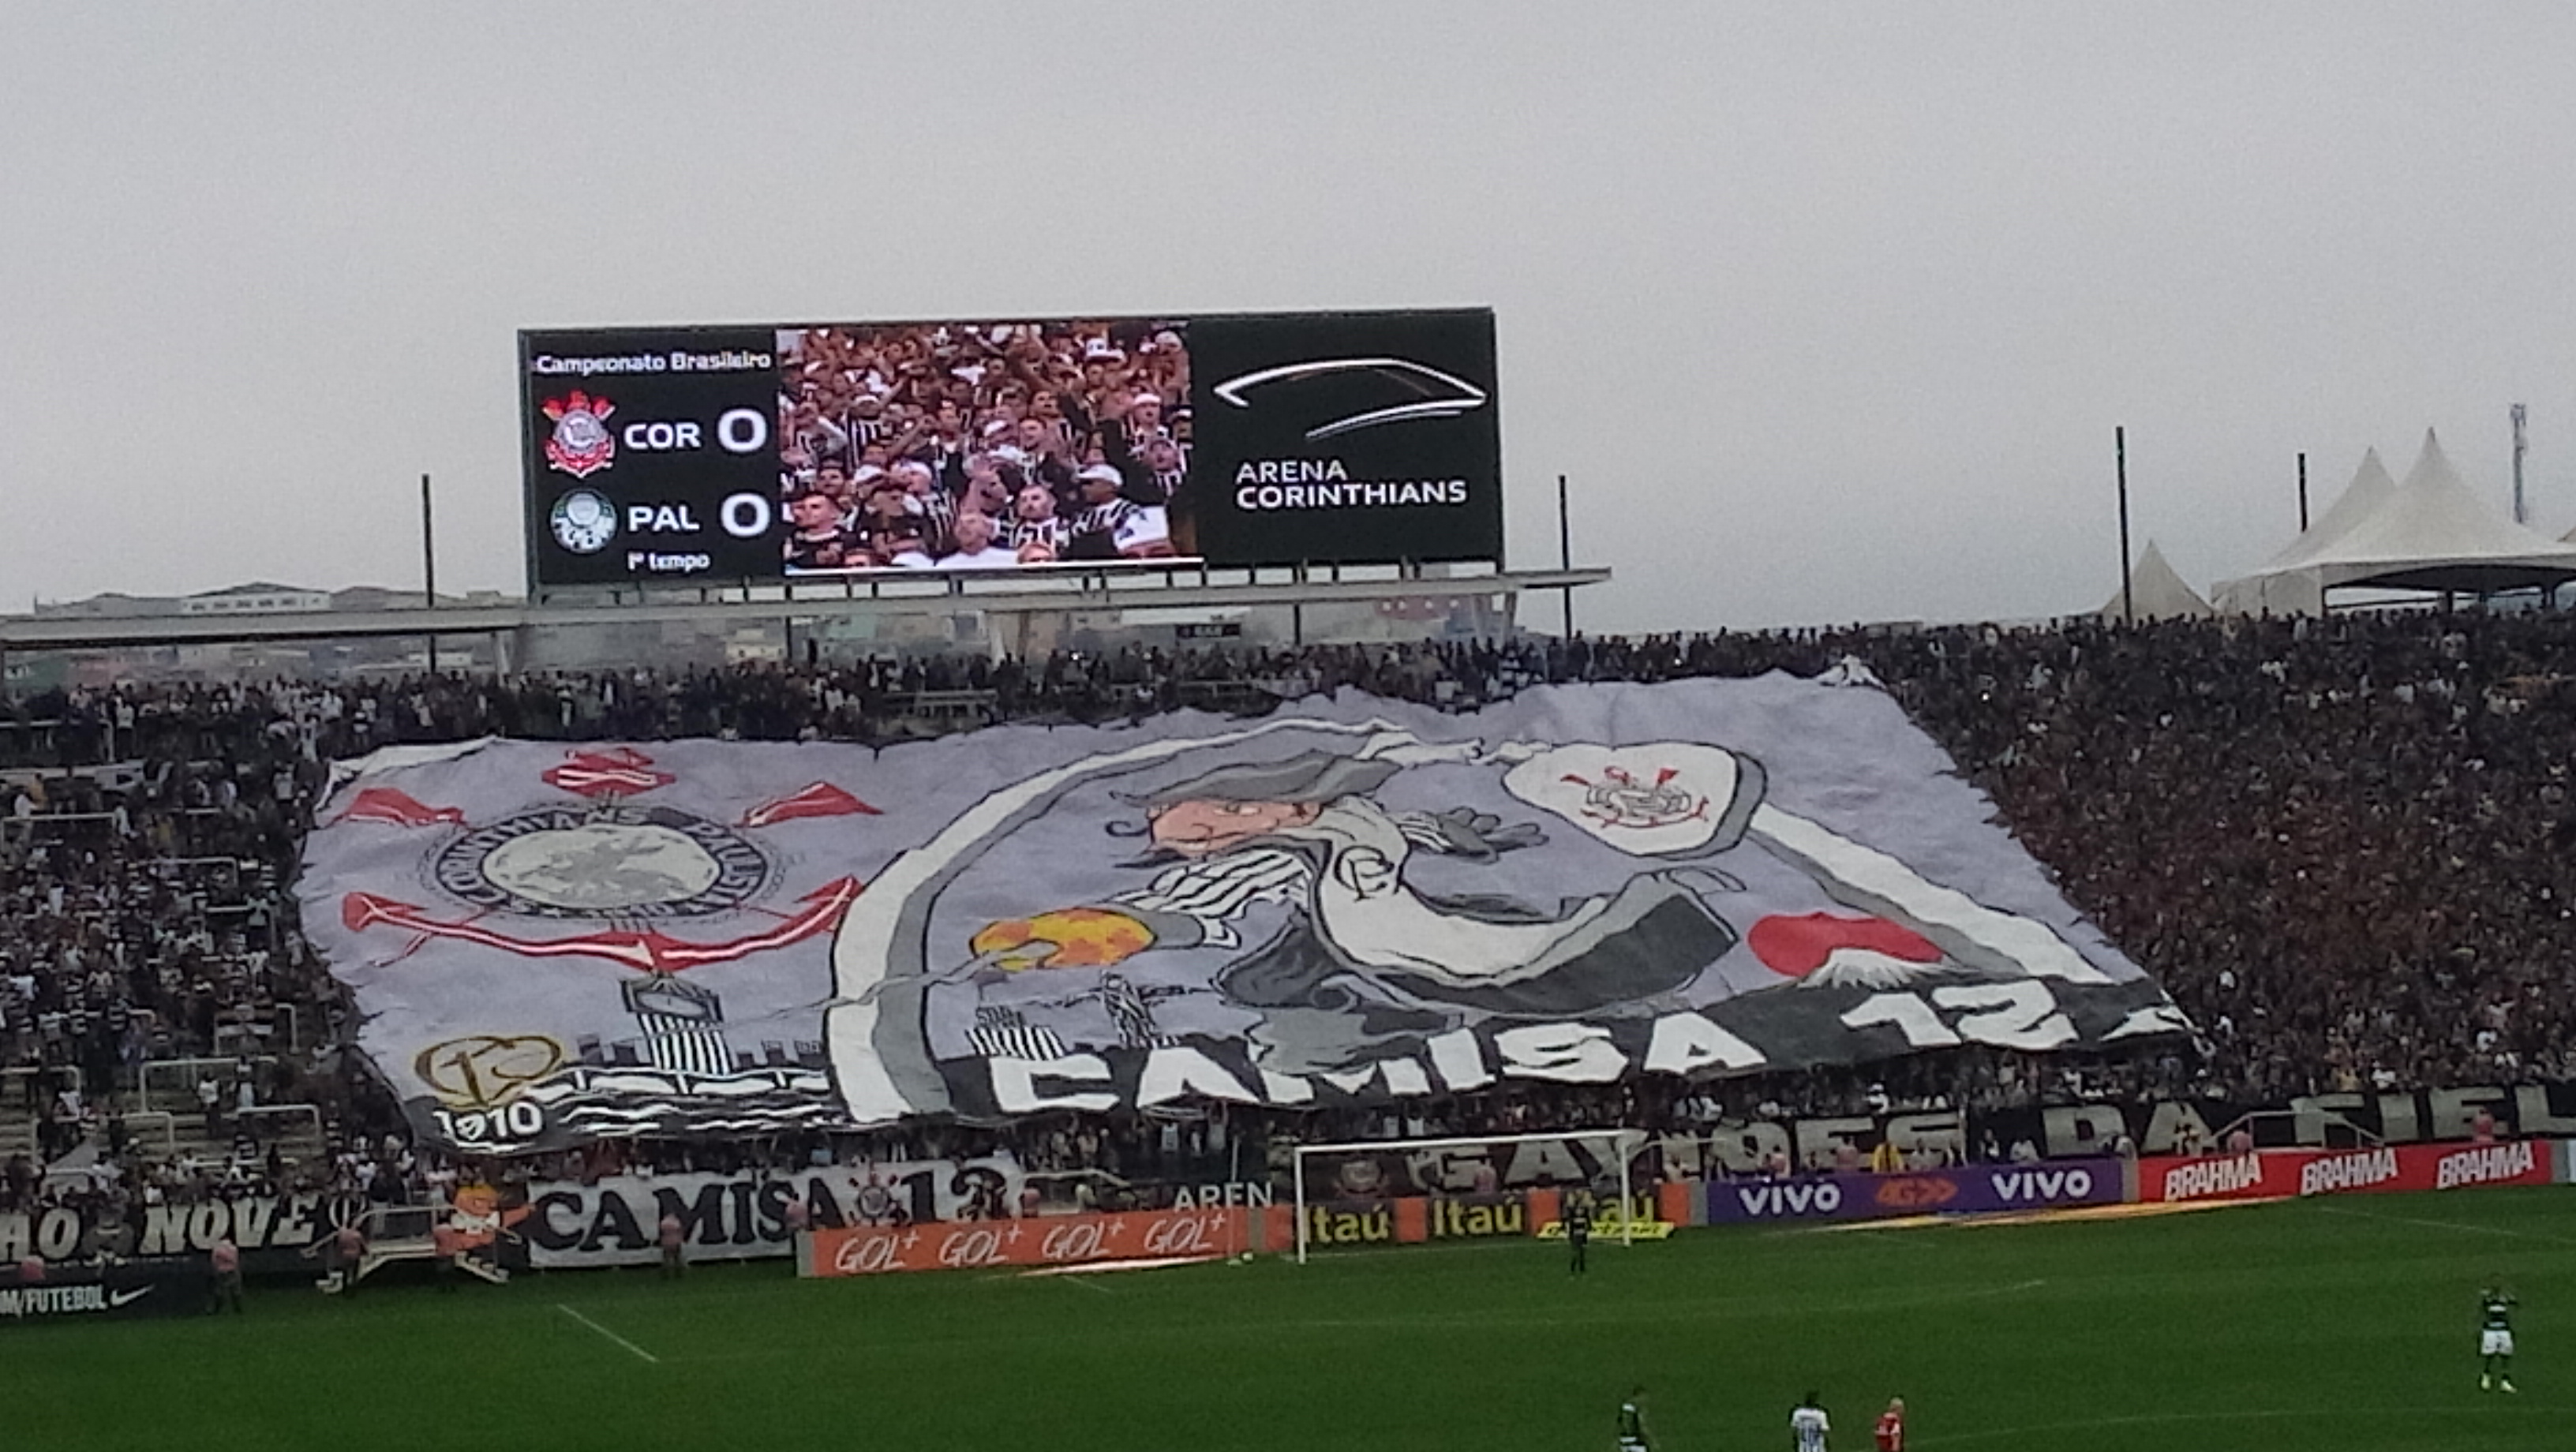 39692d99dd6d52 Ficheiro:Bandeirão da Torcida Camisa 12 - Corinthians.jpg ...